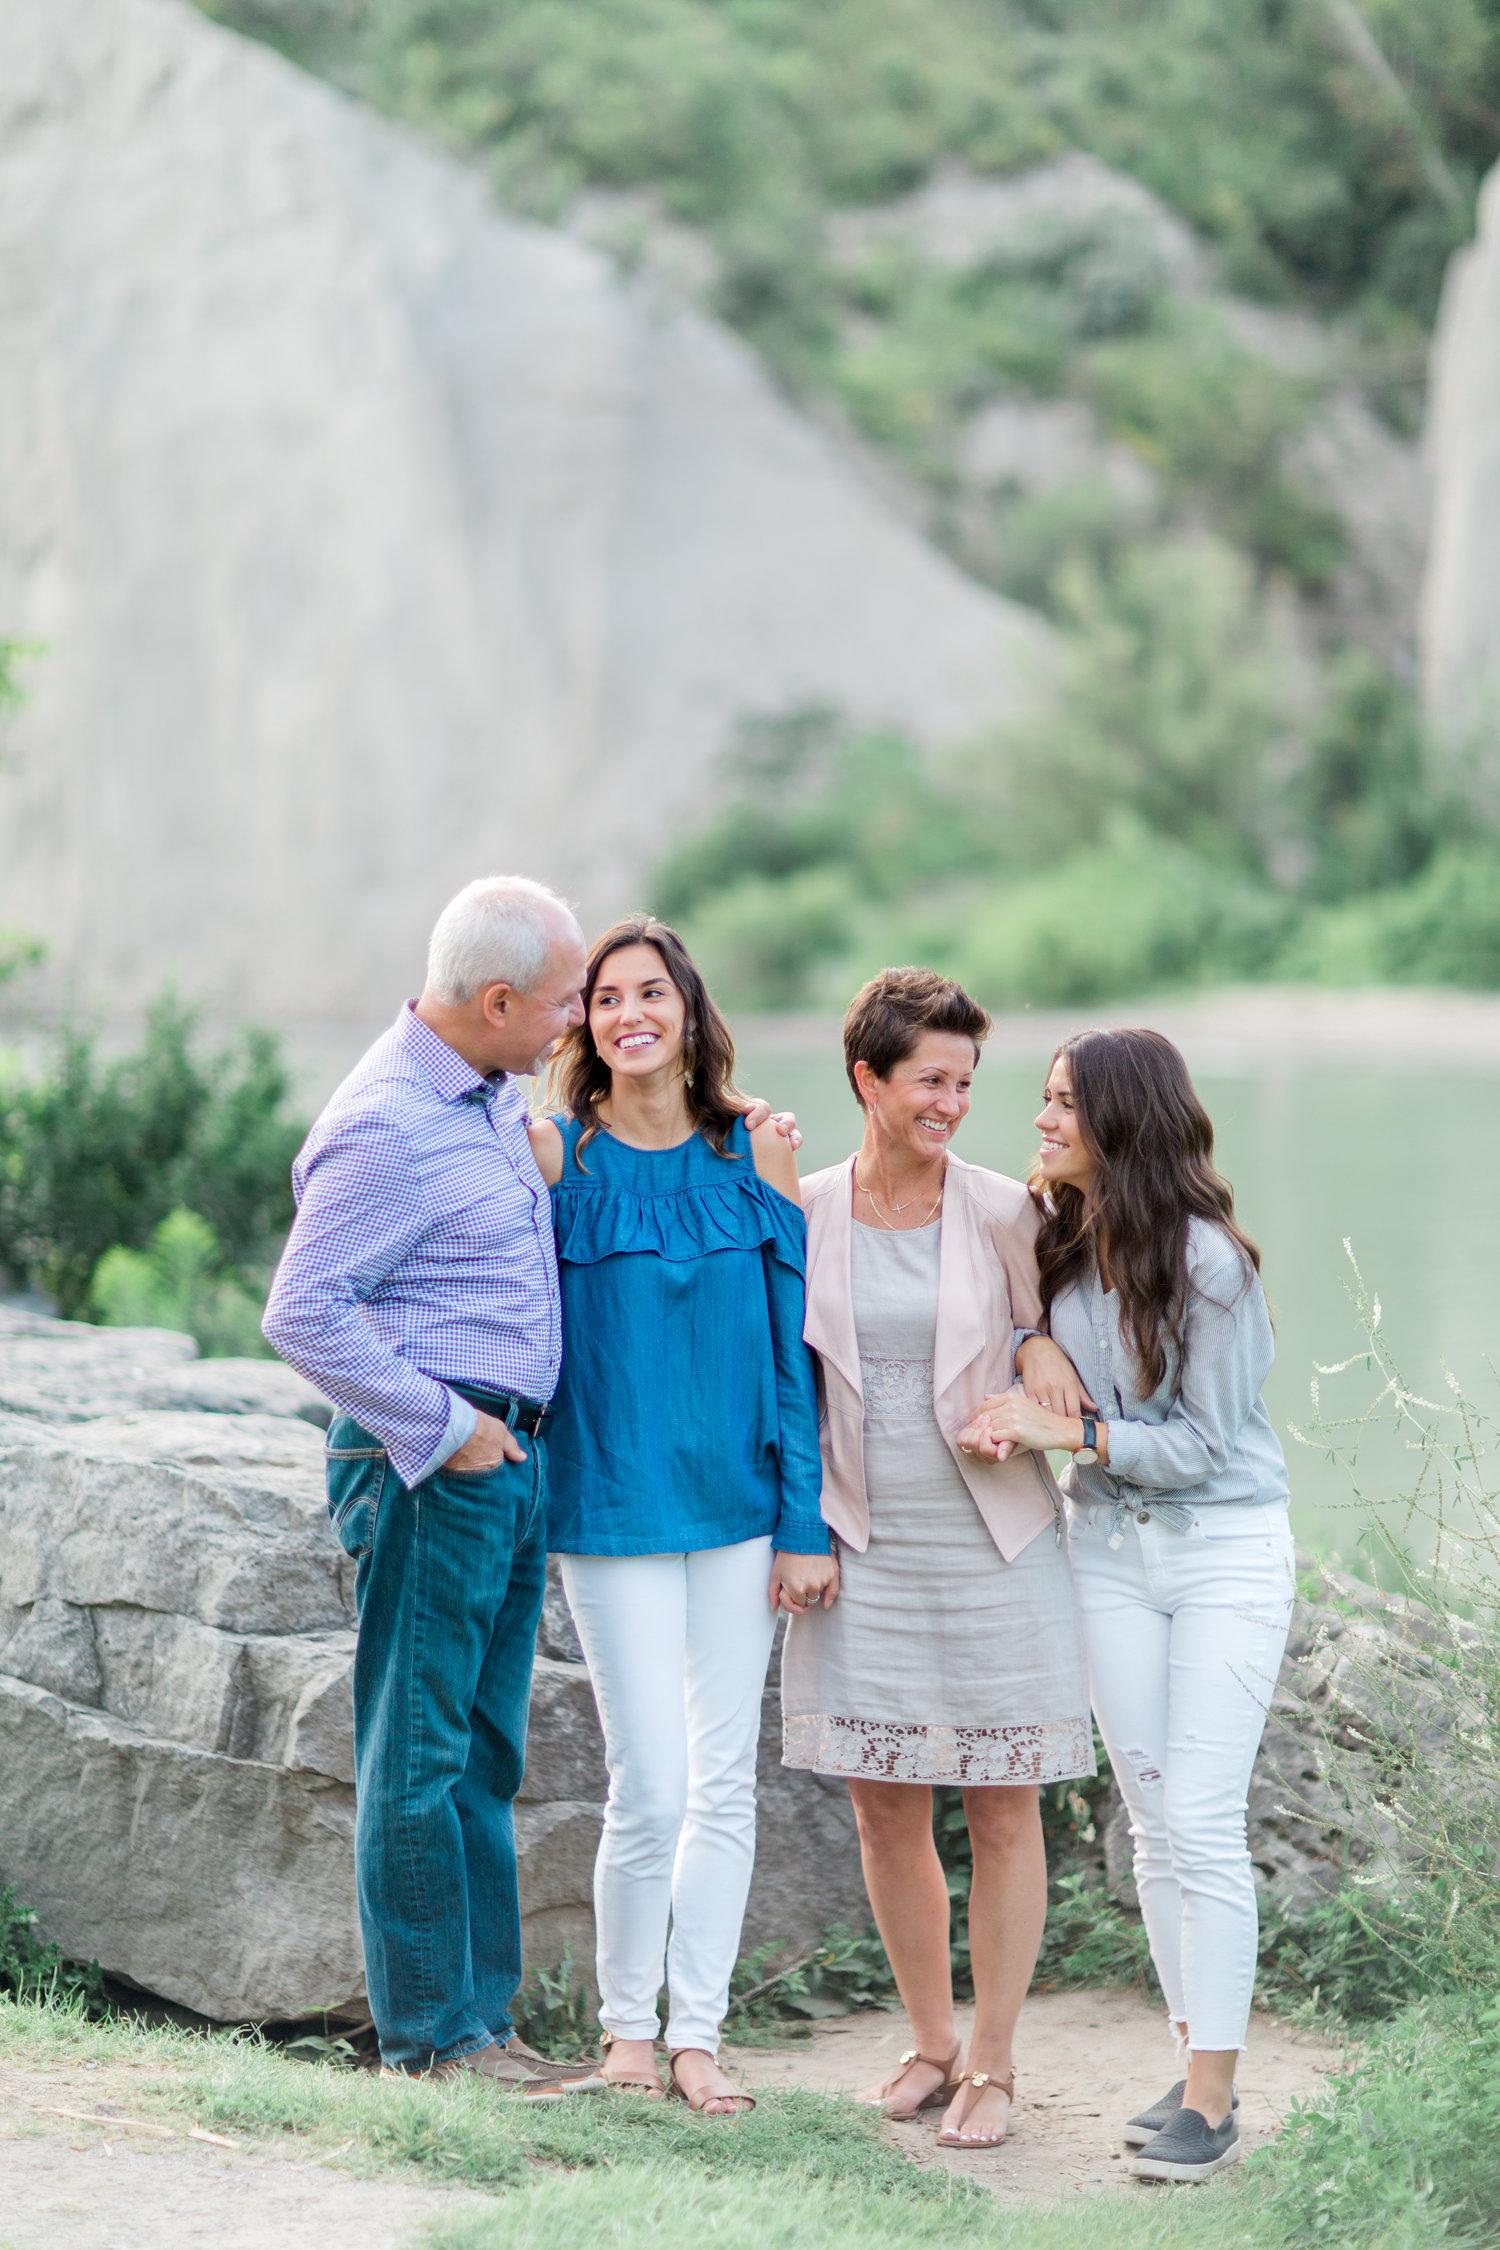 Danielle-Giroux-Amir-Golbazi-Genua-Family-Photography-Scarborough-Bluffs-0057.jpg